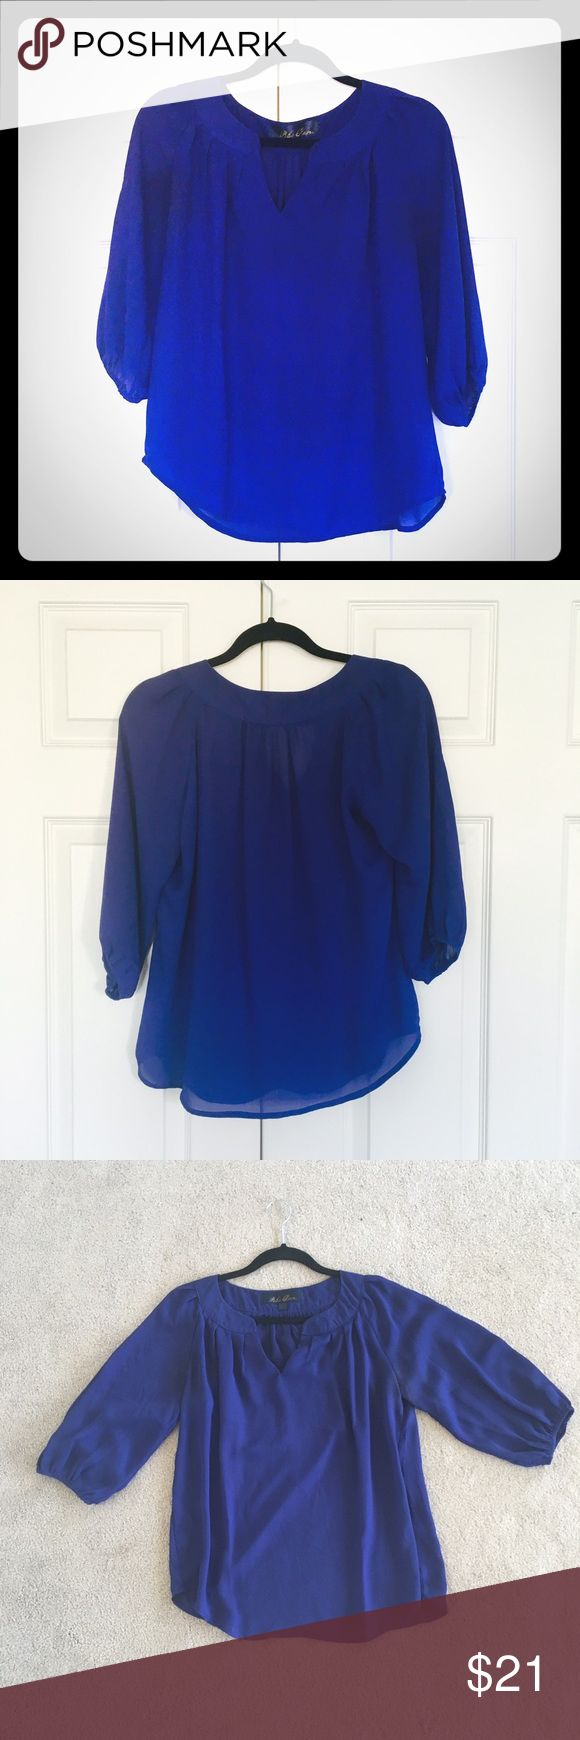 Royal Blue Blouse Outfit 58